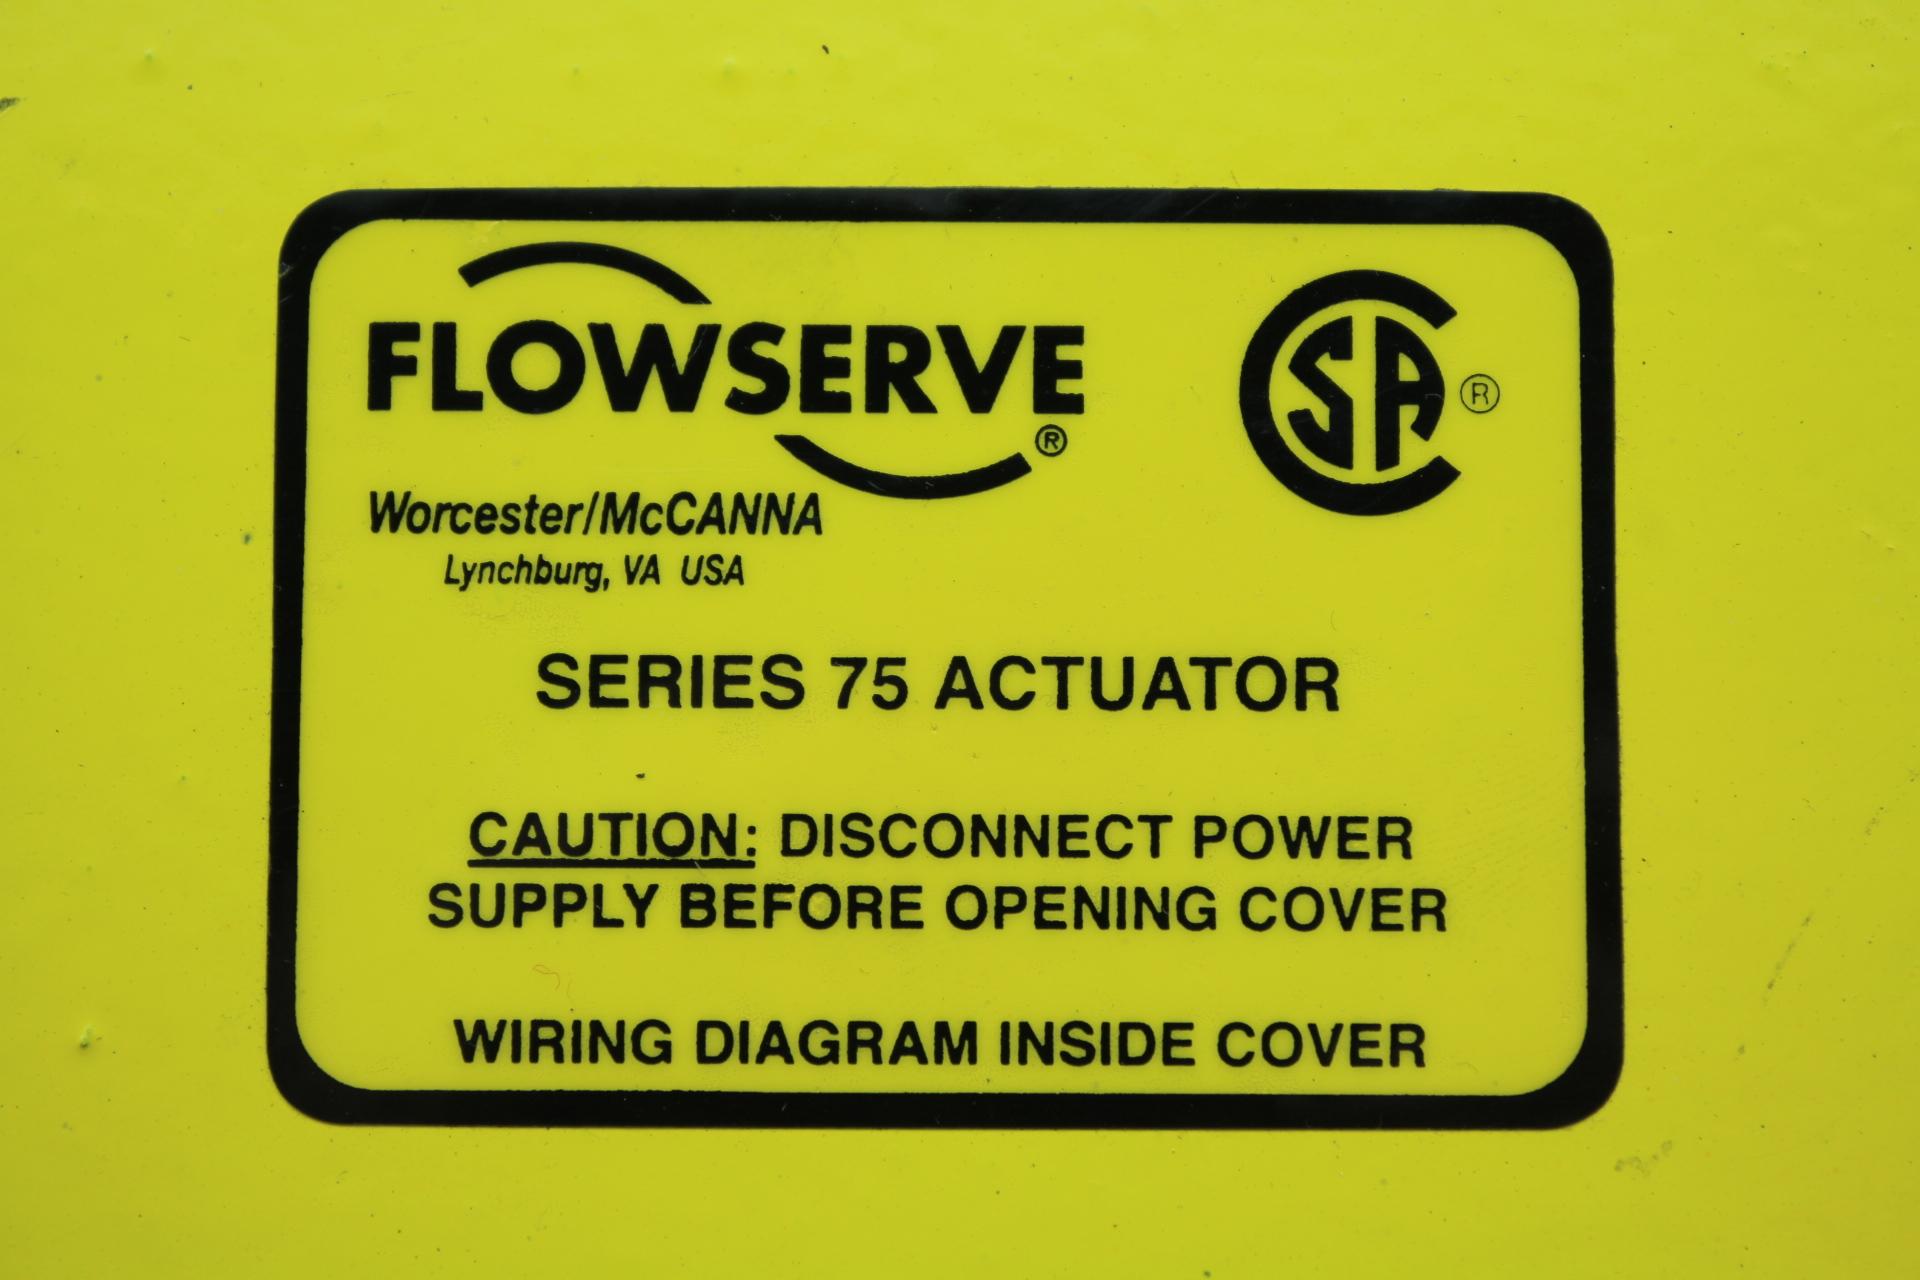 Flowserve Wiring Diagram Detailed Schematics Limitorque L120 Series 75 Actuator Model 25h754z 120a Basic